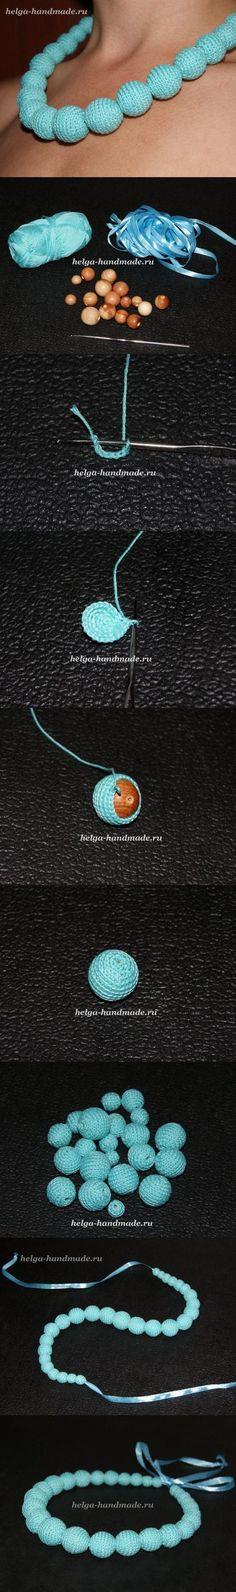 DIY Blue Knitting Beads Collar diy craft crafts easy crafts diy crafts easy diy diy jewelry craft jewelry craft fashion teen crafts crafts for teens Crochet Diy, Bead Crochet, Beaded Jewelry, Handmade Jewelry, Beaded Necklace, Gold Jewelry, Crochet Bracelet, Crochet Earrings, Crochet Patron